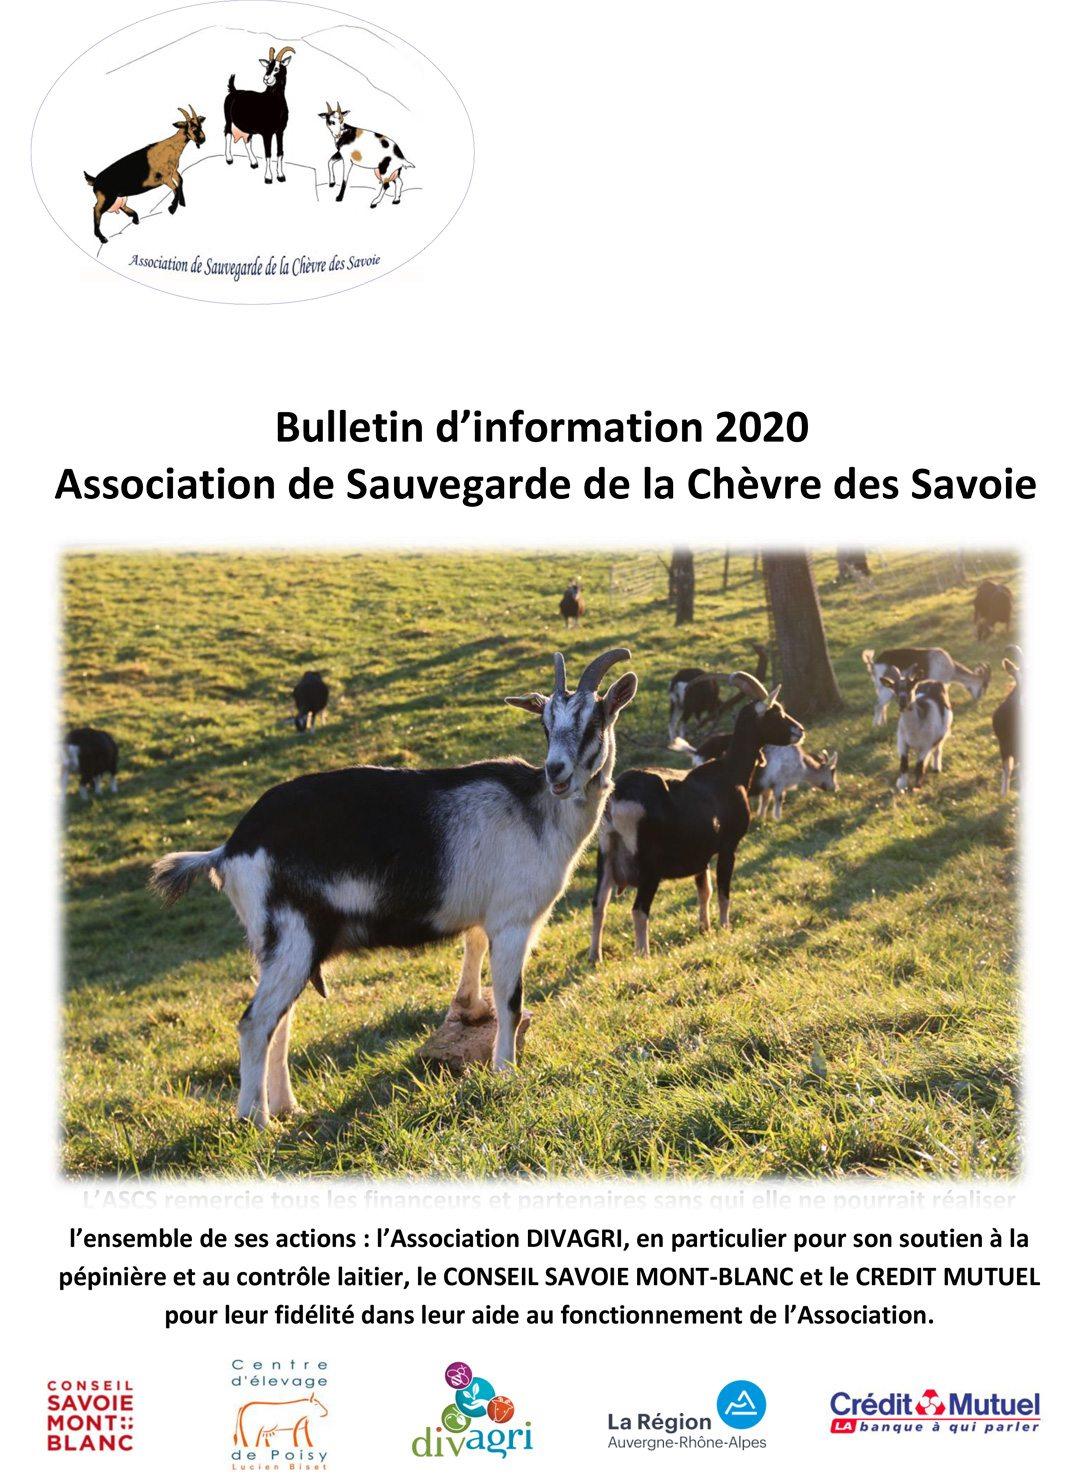 Le bulletin de l'ASCS 2019-2020